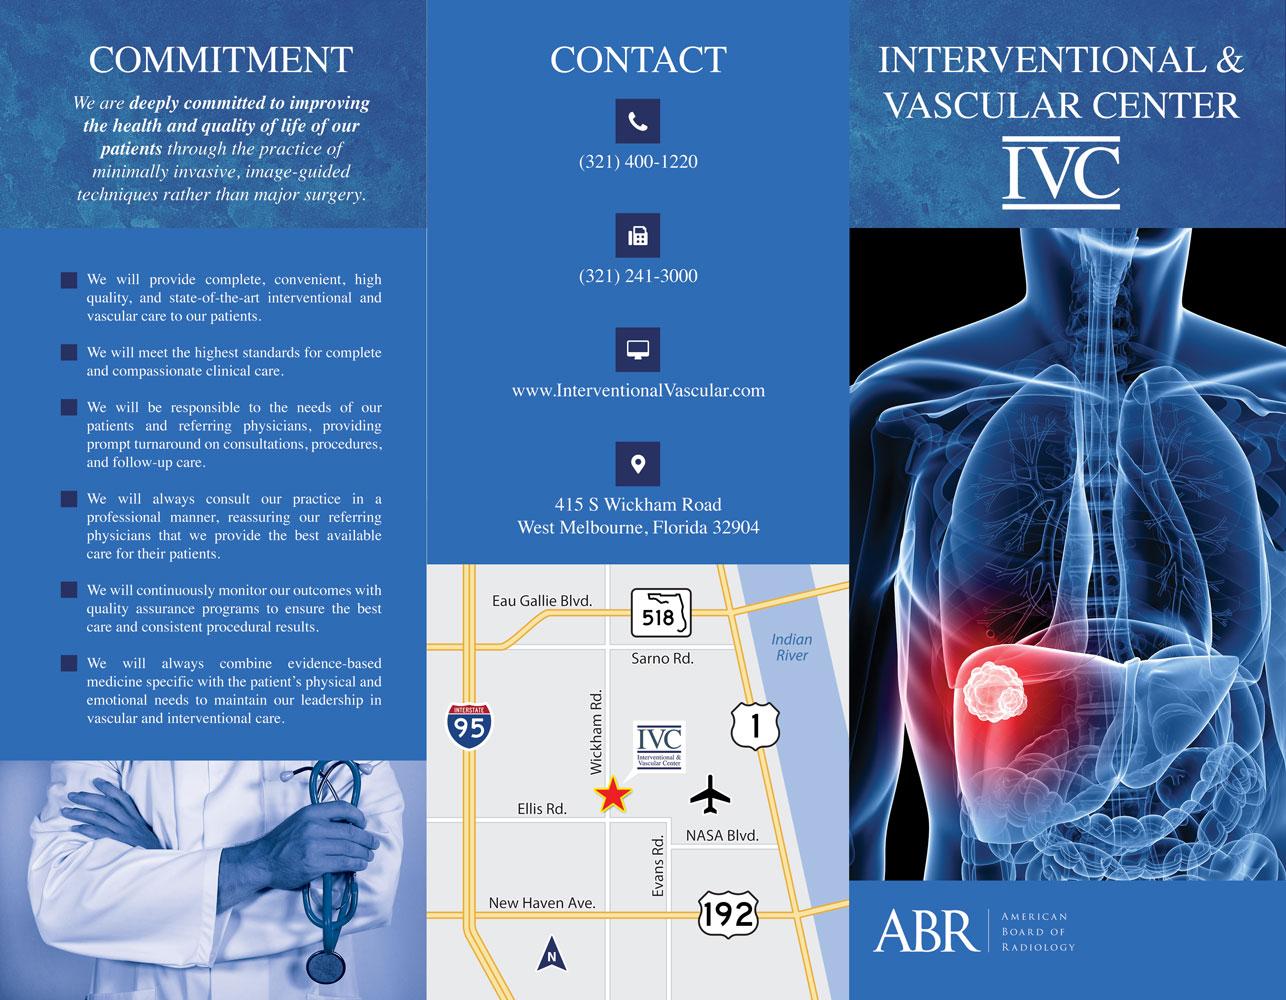 New Trifolds for the Interventional & Vascular Center (IVC) 06